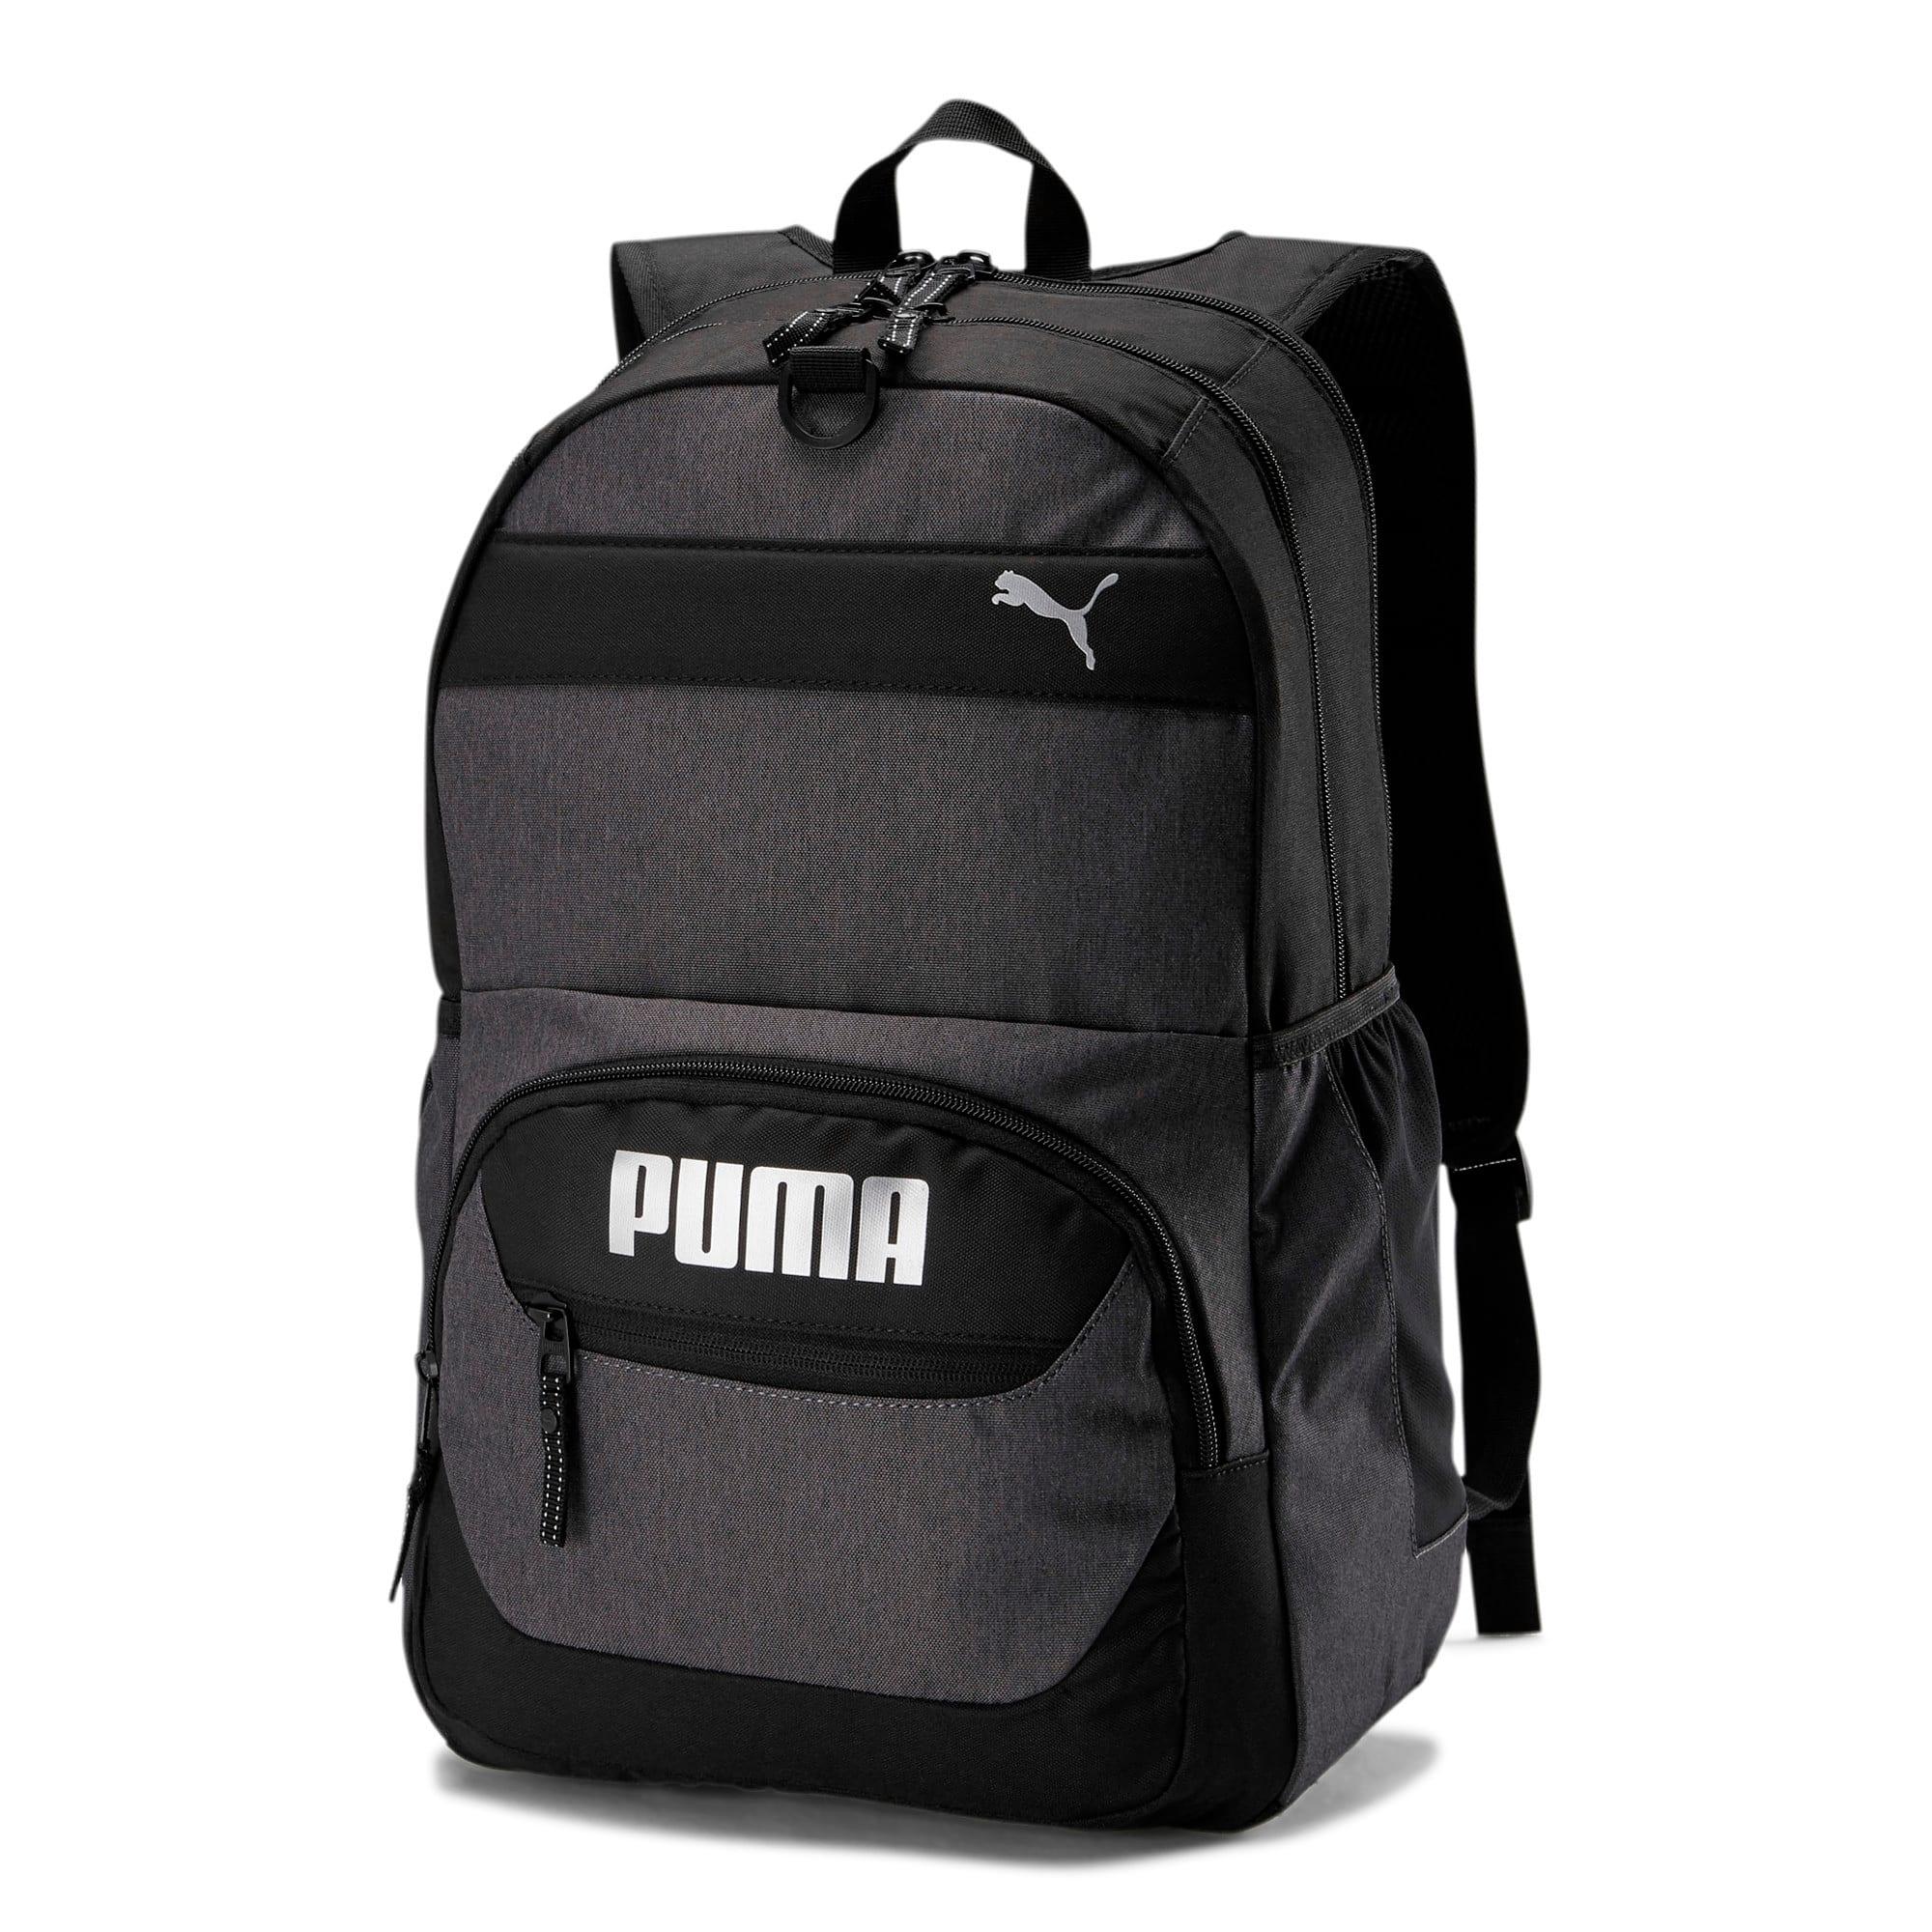 Thumbnail 1 of PUMA Everready Backpack, Dark Grey, medium